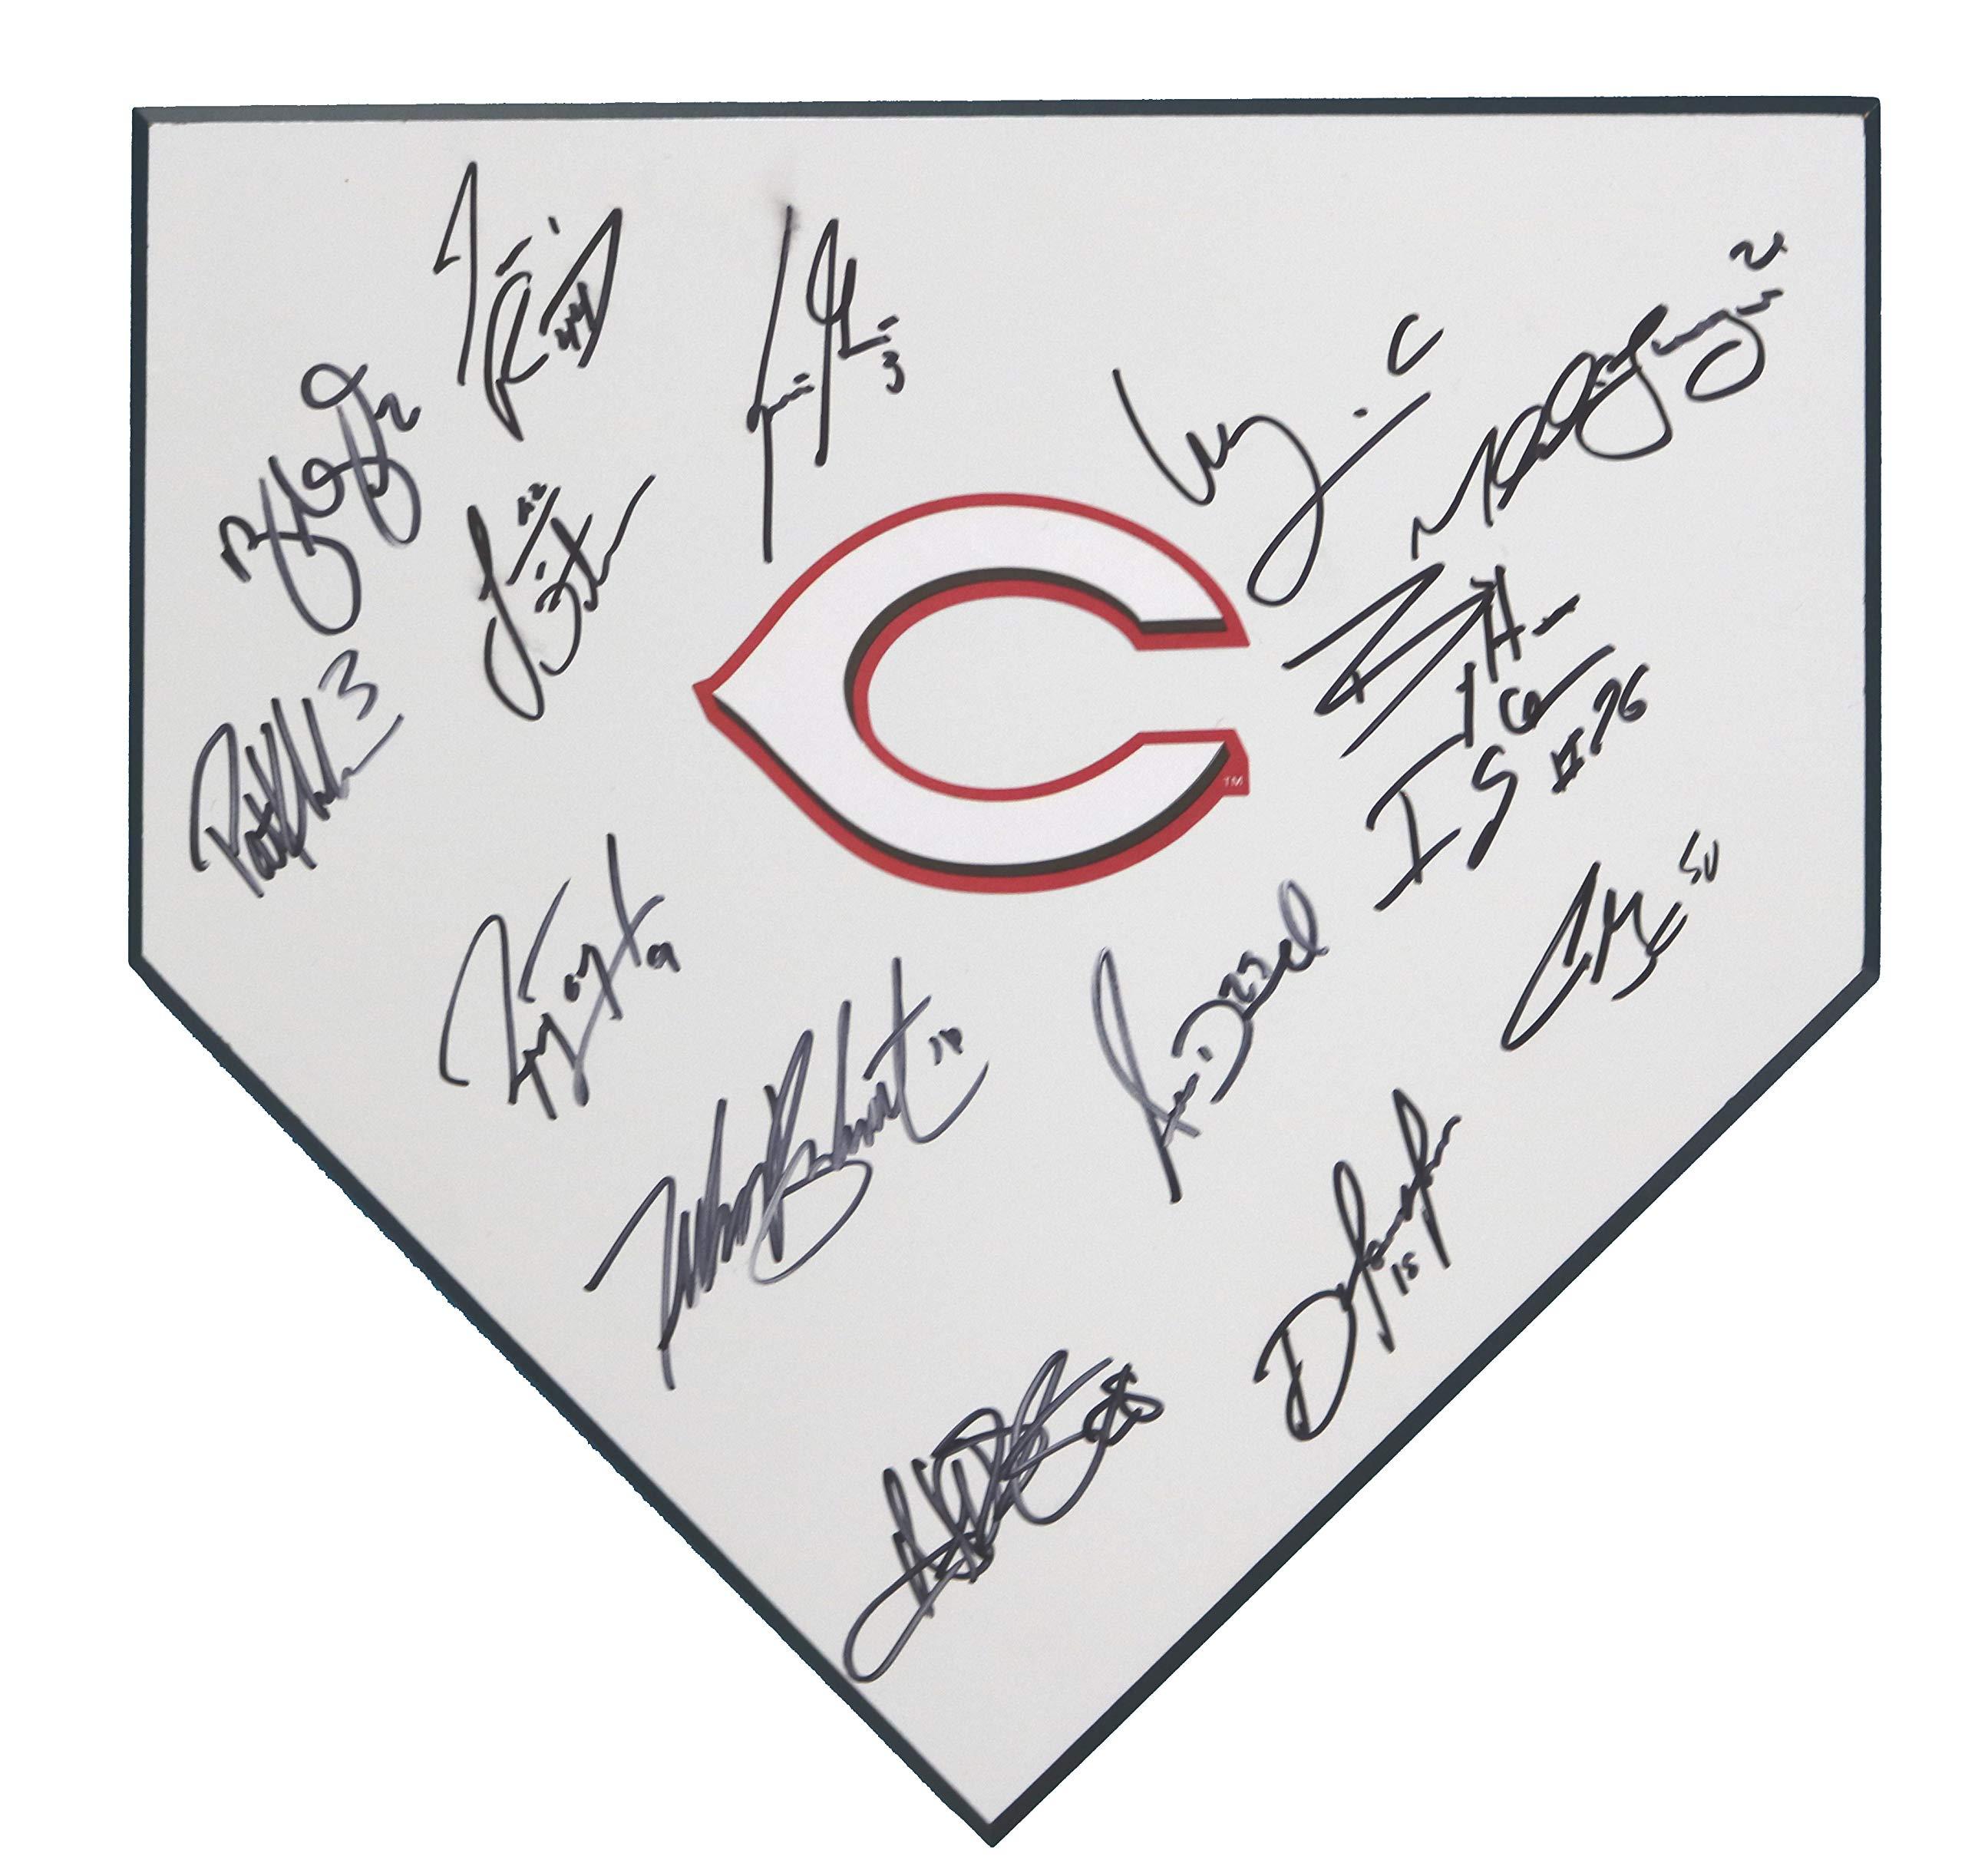 Cincinnati Reds 2017 18 Team Signed Autographed Home Plate 15 Autographs Gennett Hamilton